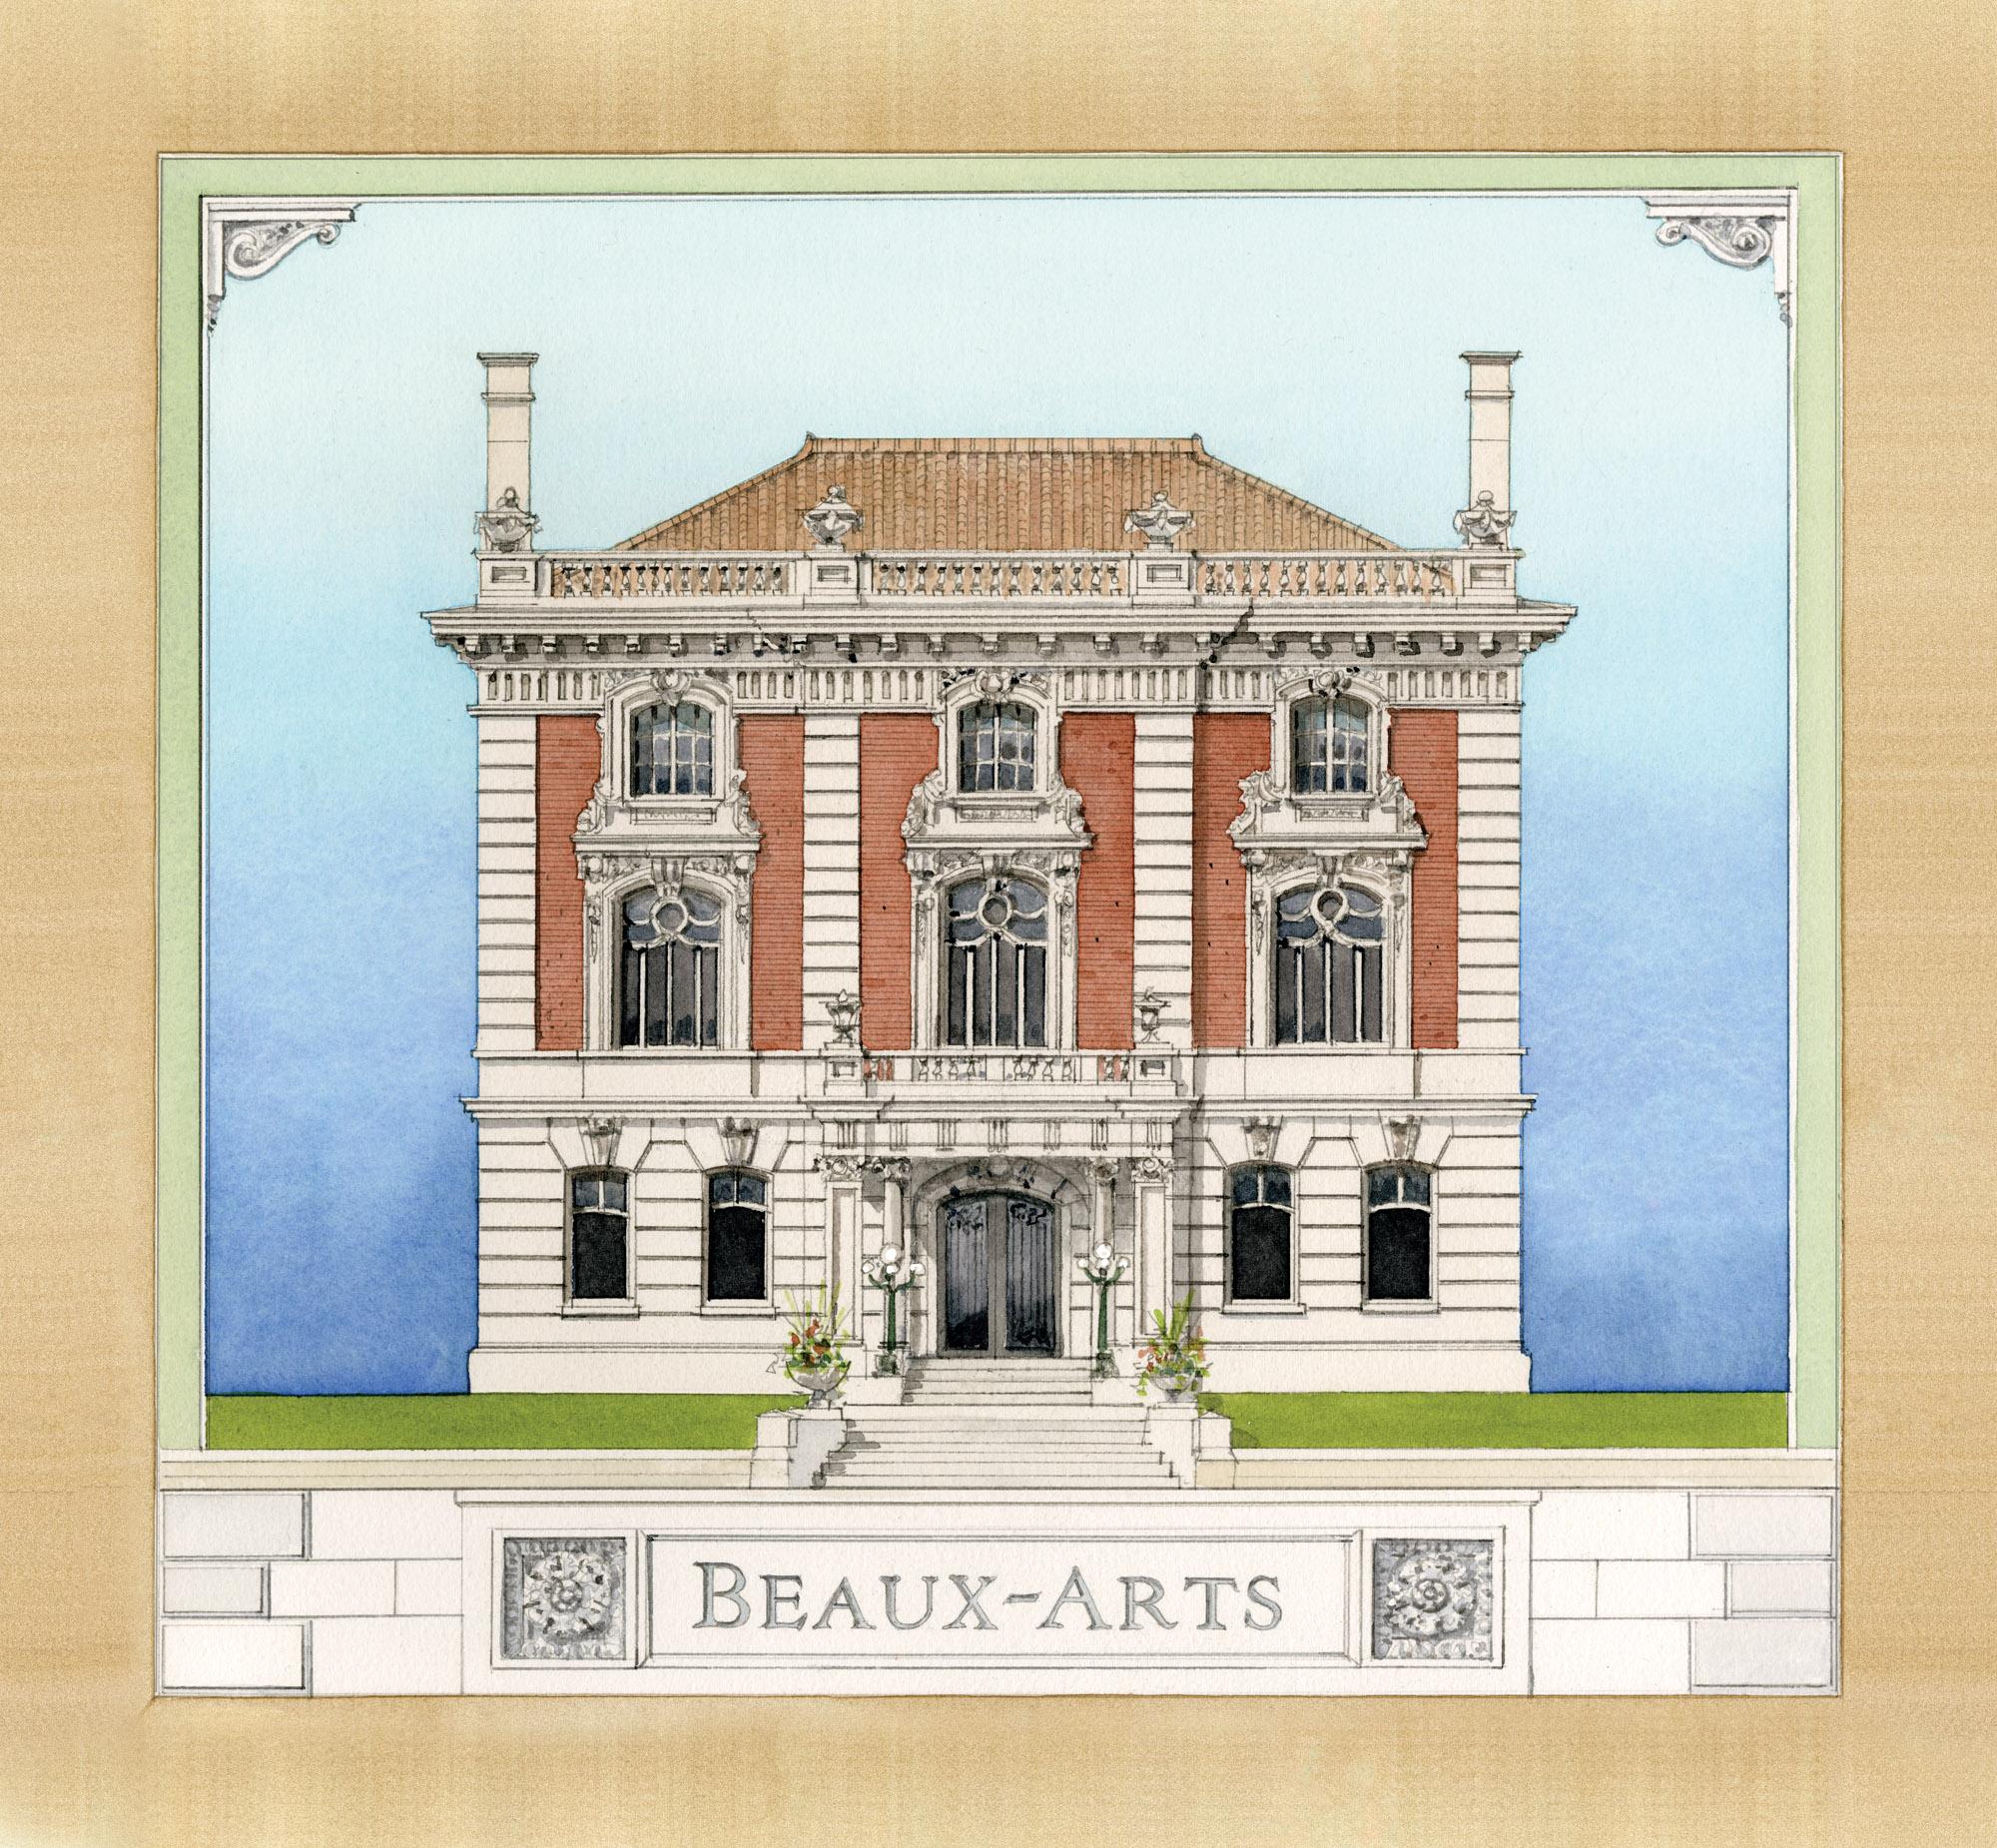 Beaux-Arts style illustration